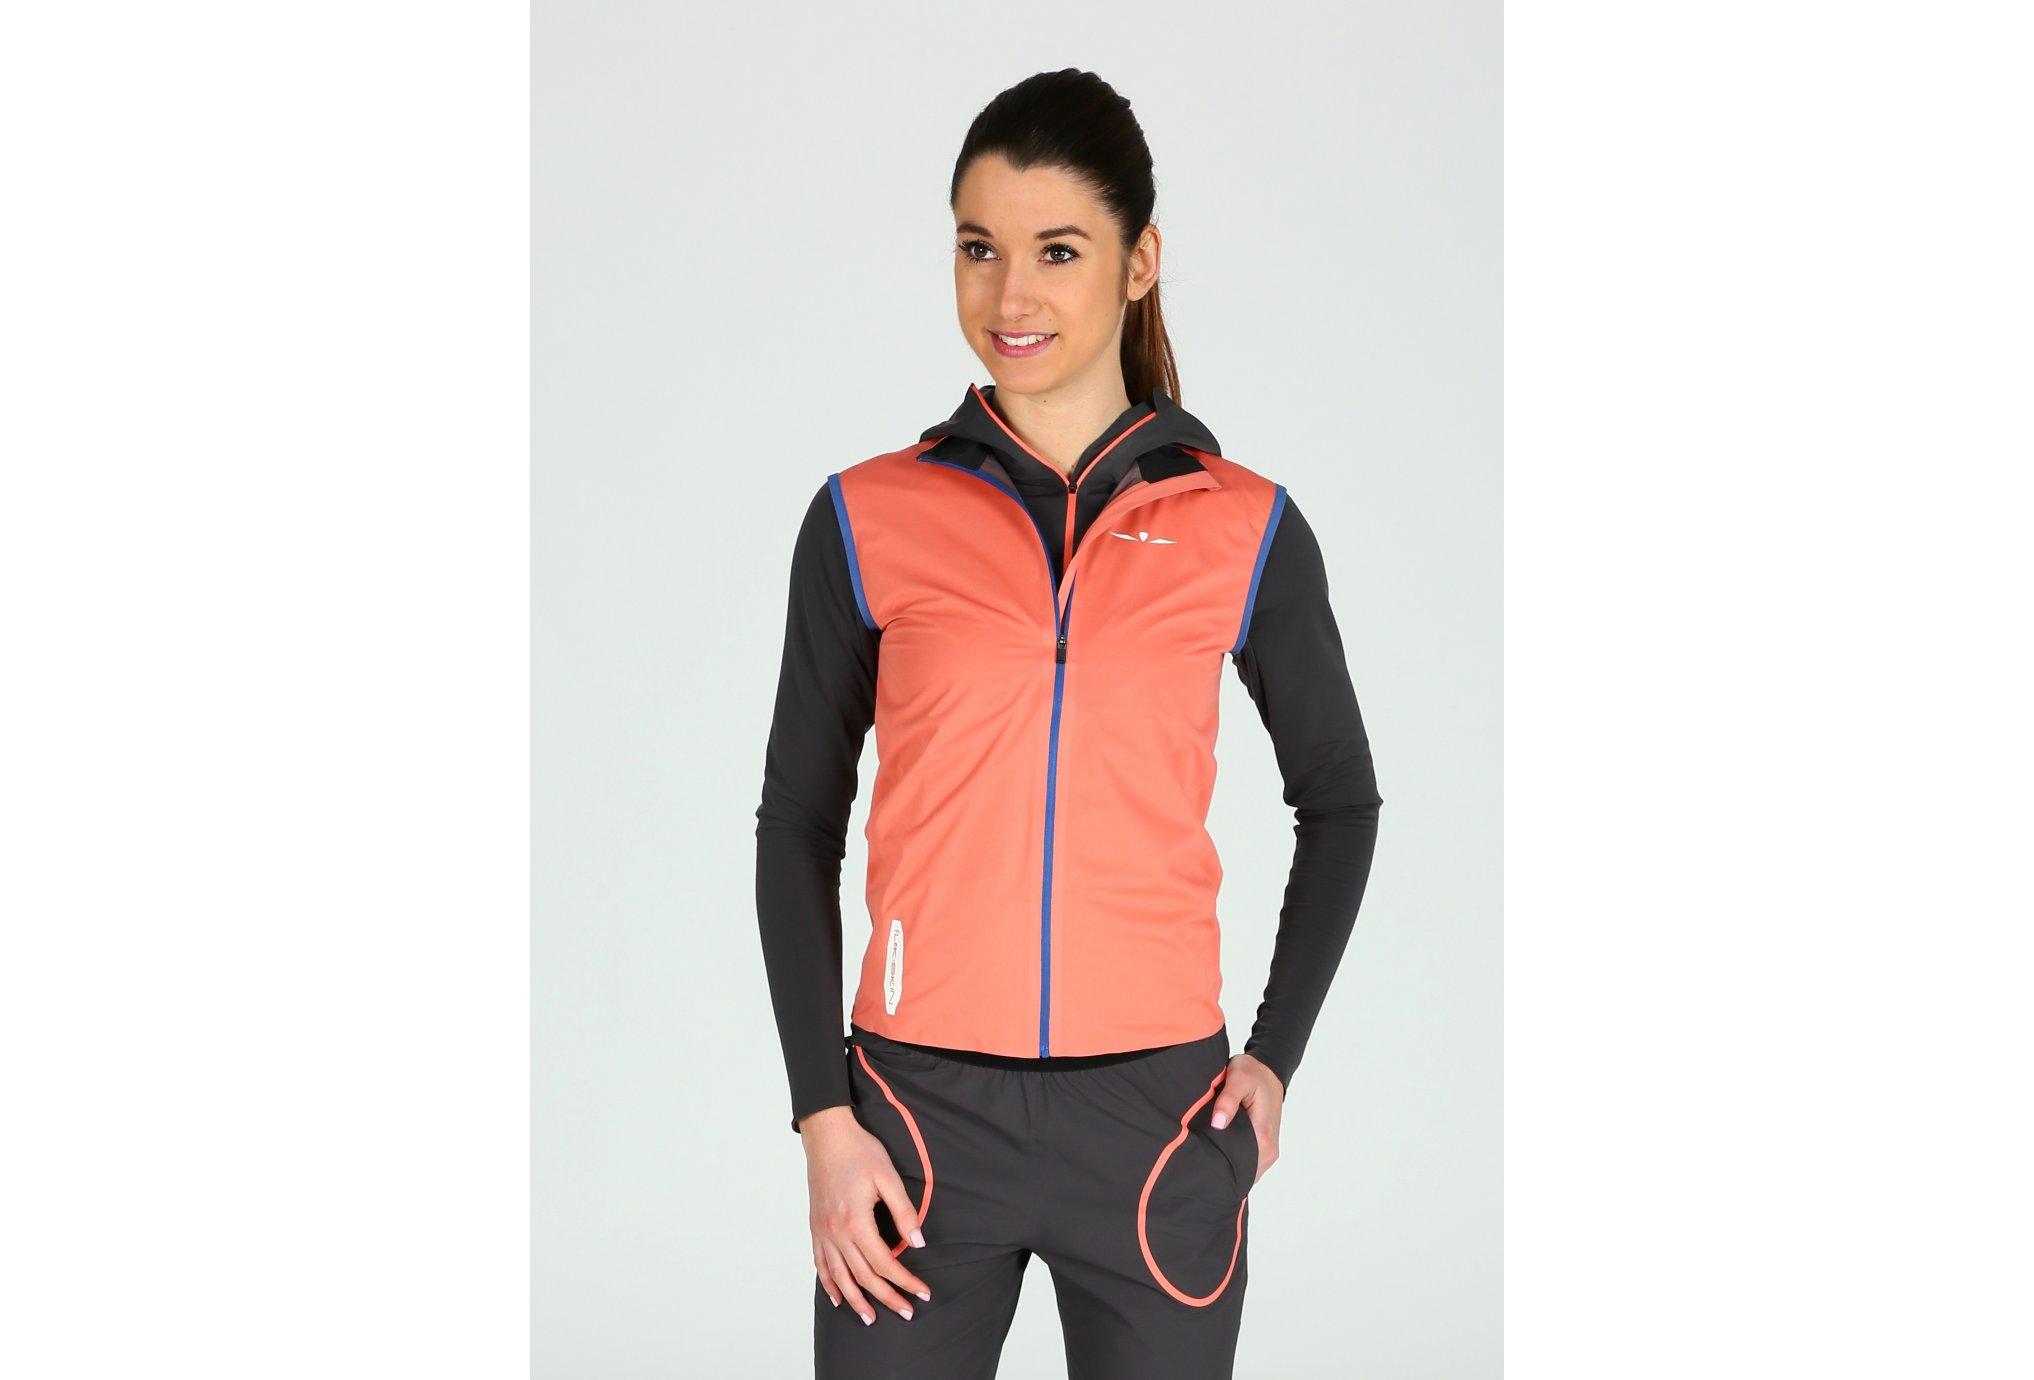 Uglow Soft Shell FlexSkin 4 W Diététique Vêtements femme